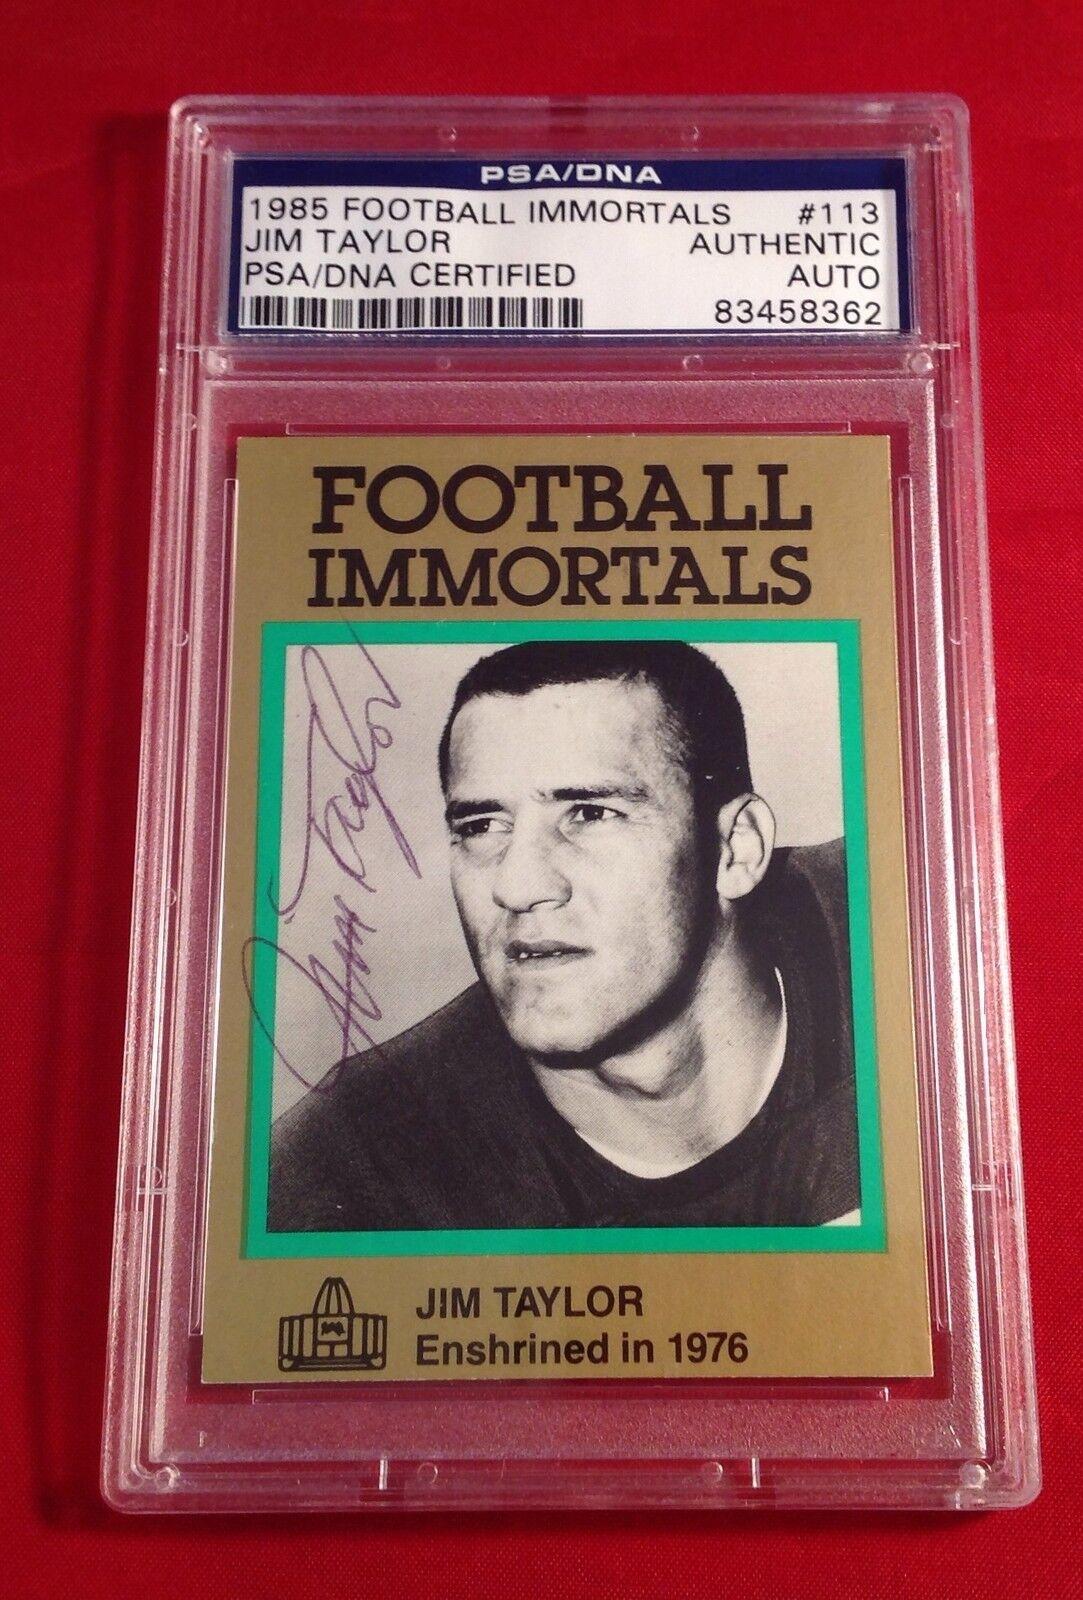 Jim Taylor 1985 Football Immortals Card PSA/DNA Slabbed #83458362